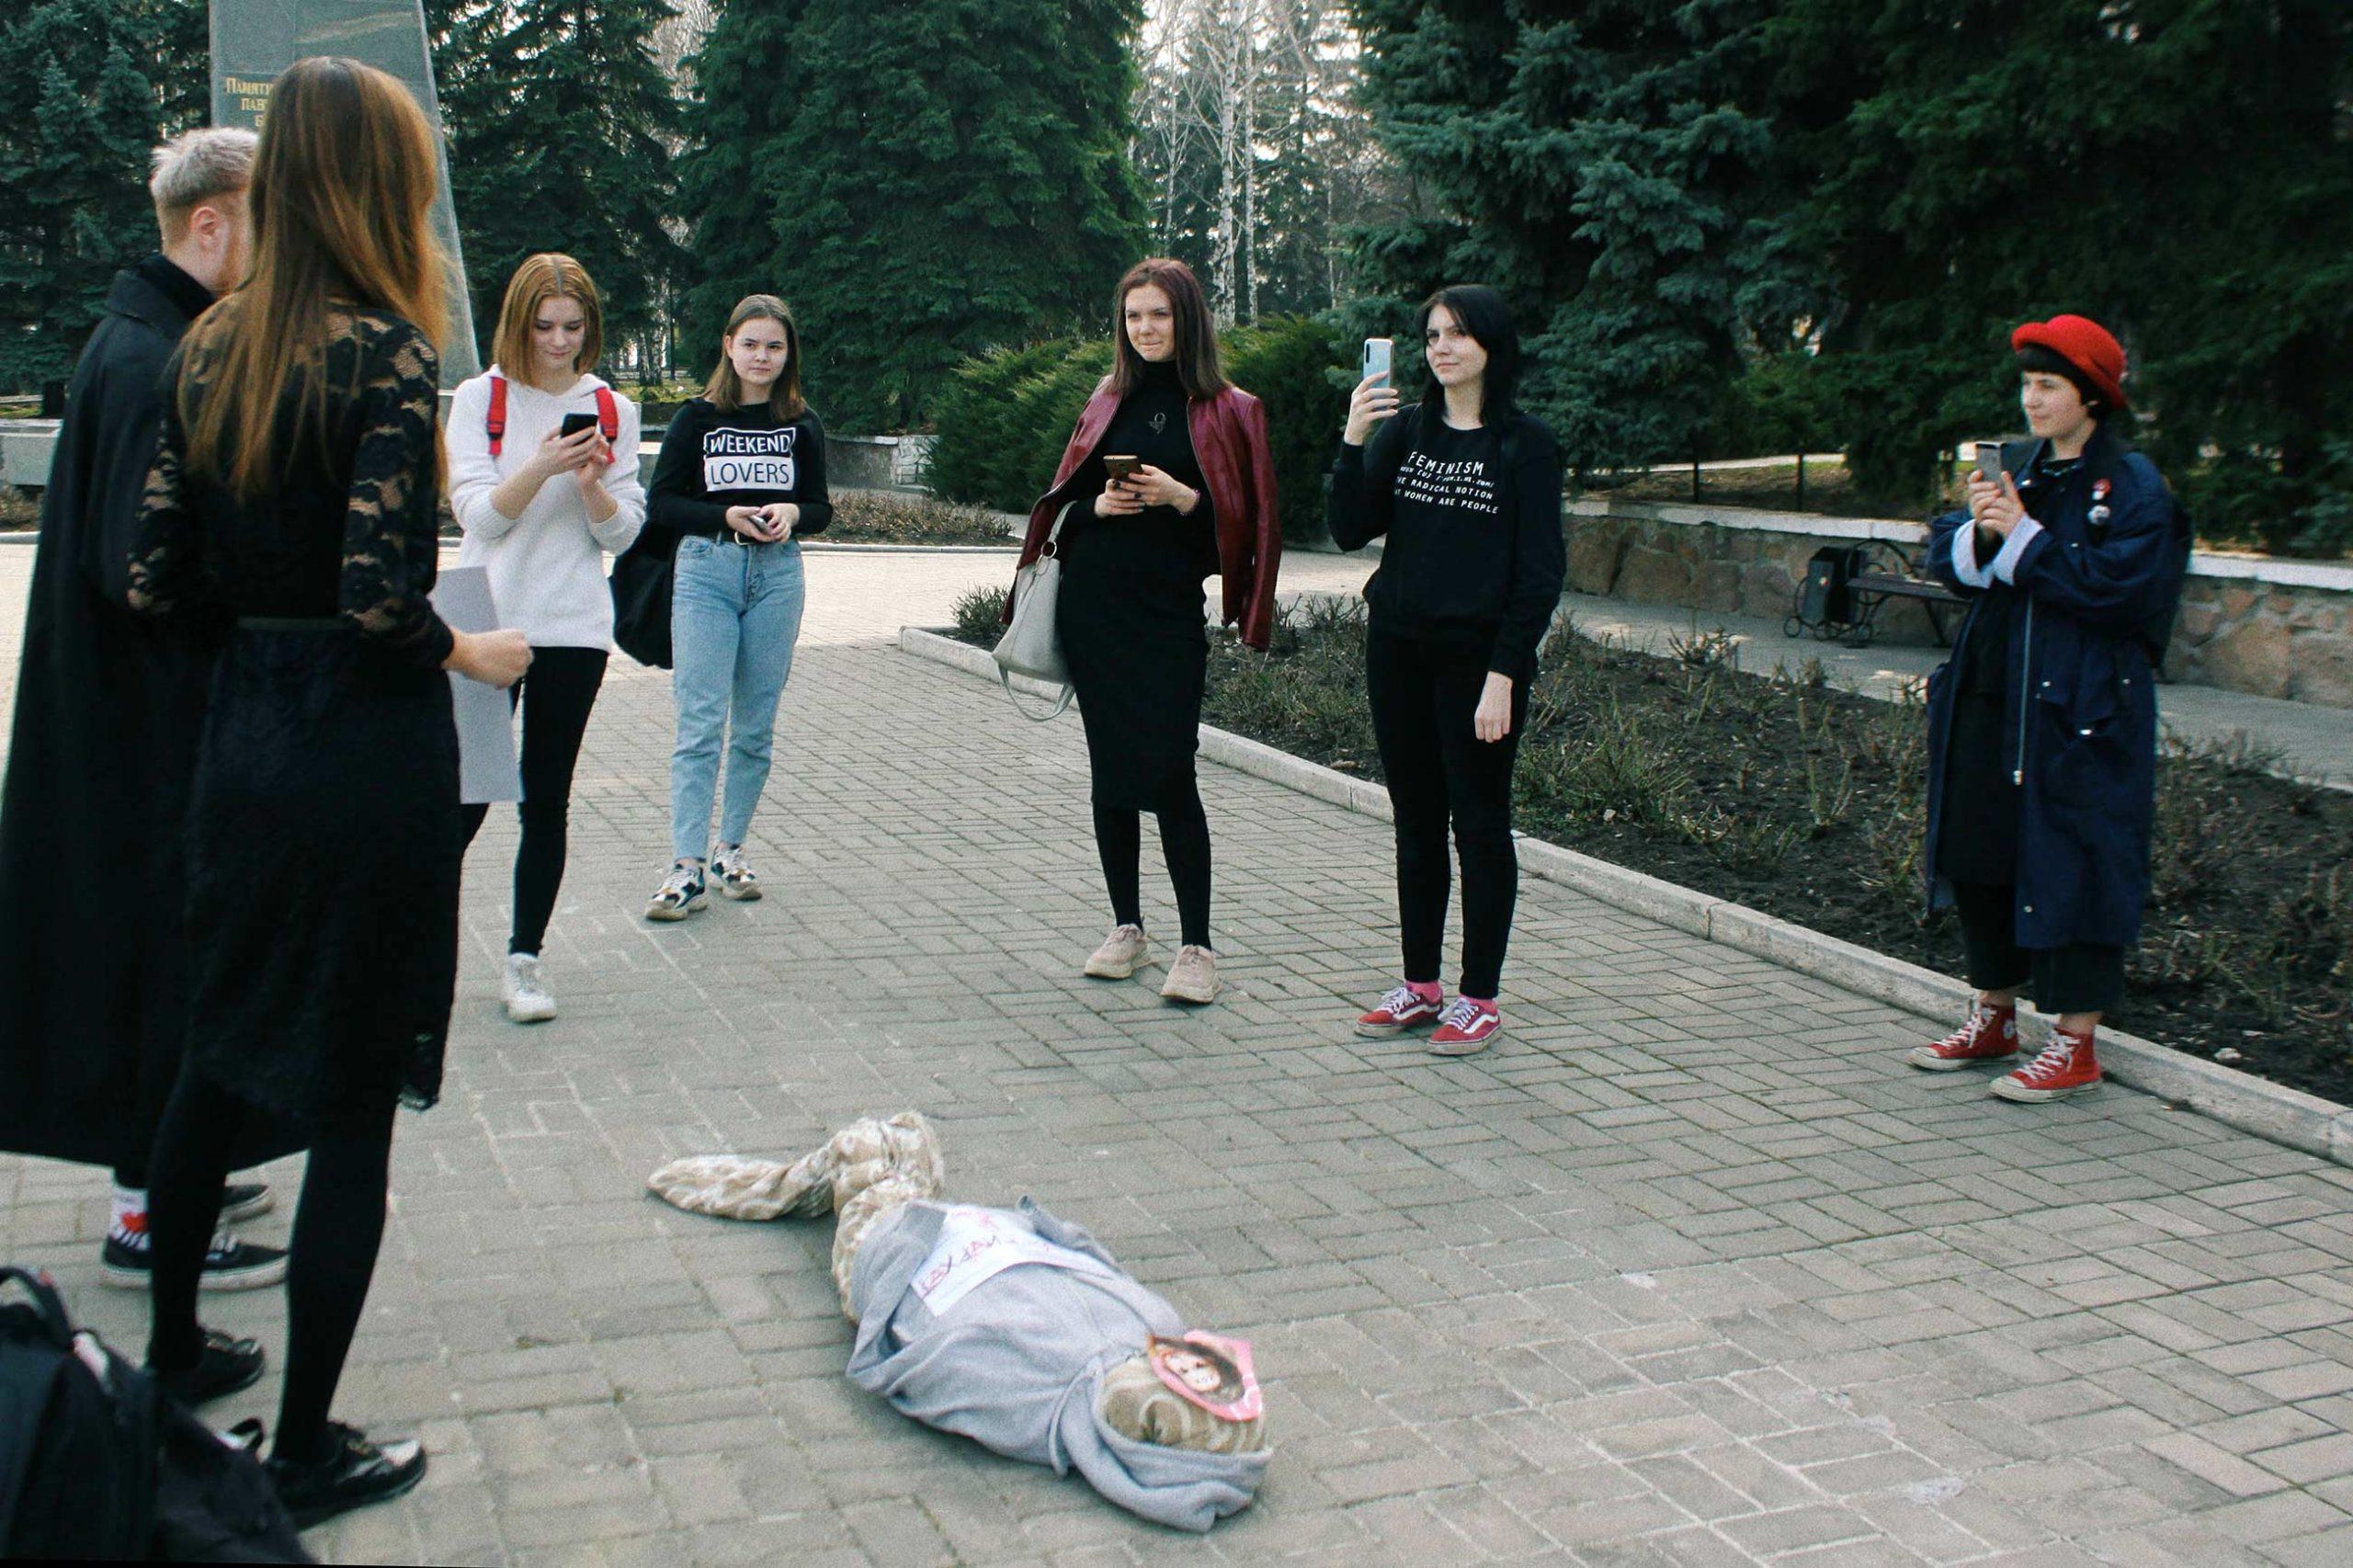 queer donbas 10.03 scaled - <b>«Донбас-квір».</b> Як активіст із Бахмута дав голос ЛГБТ-спільноті Донбасу - Заборона